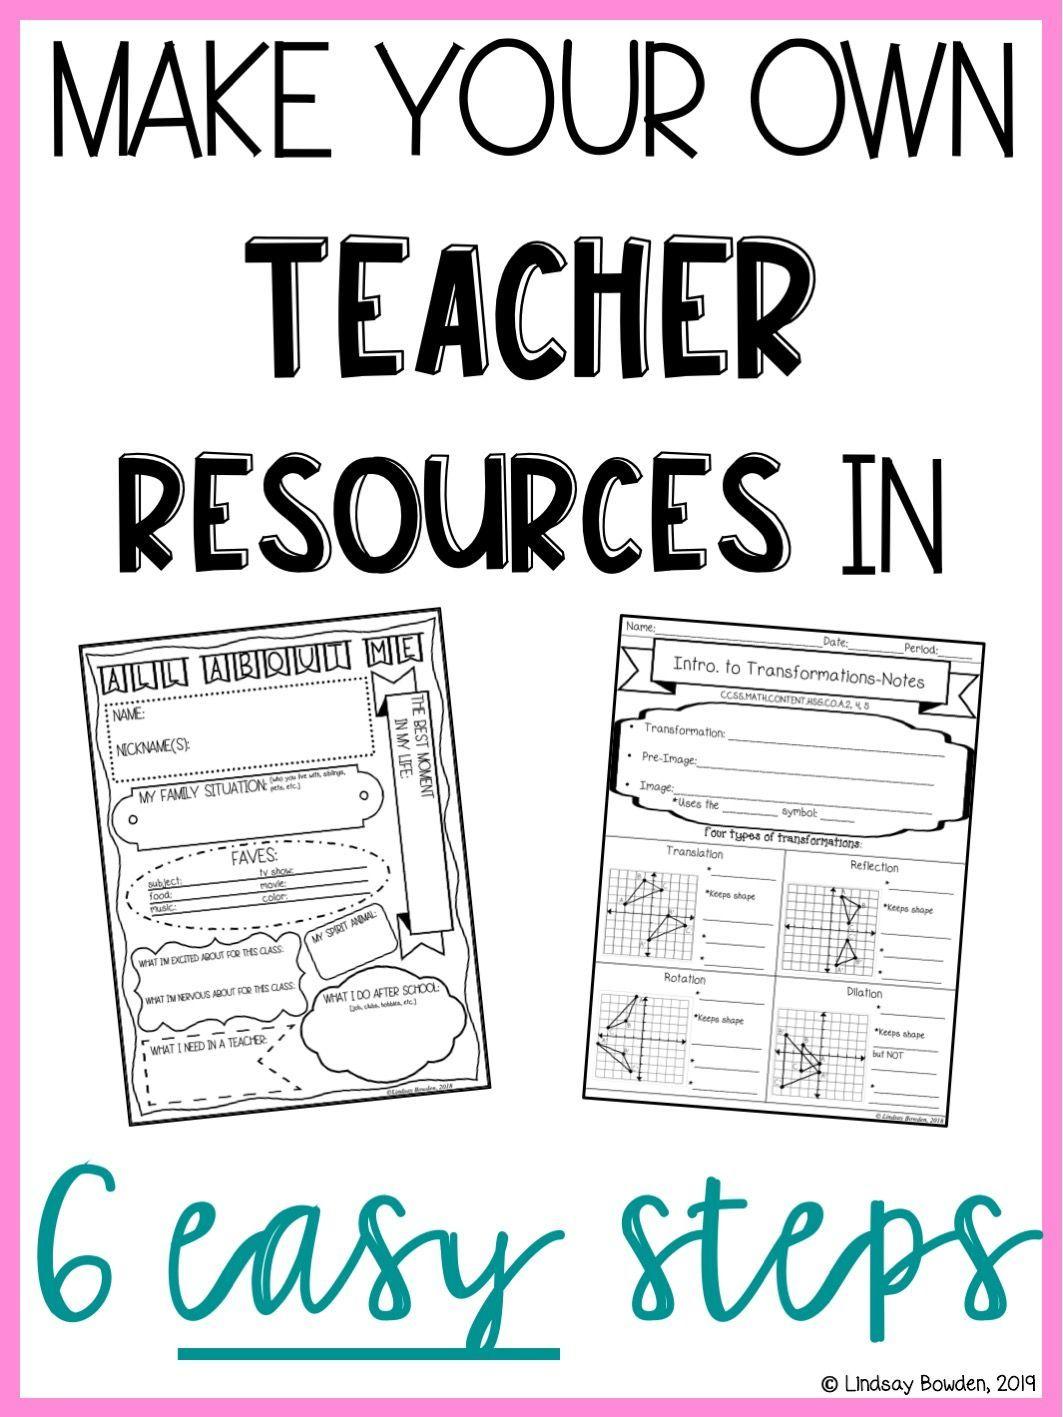 - Make Worksheets In 6 Easy Steps Teacher Resources, Teacher